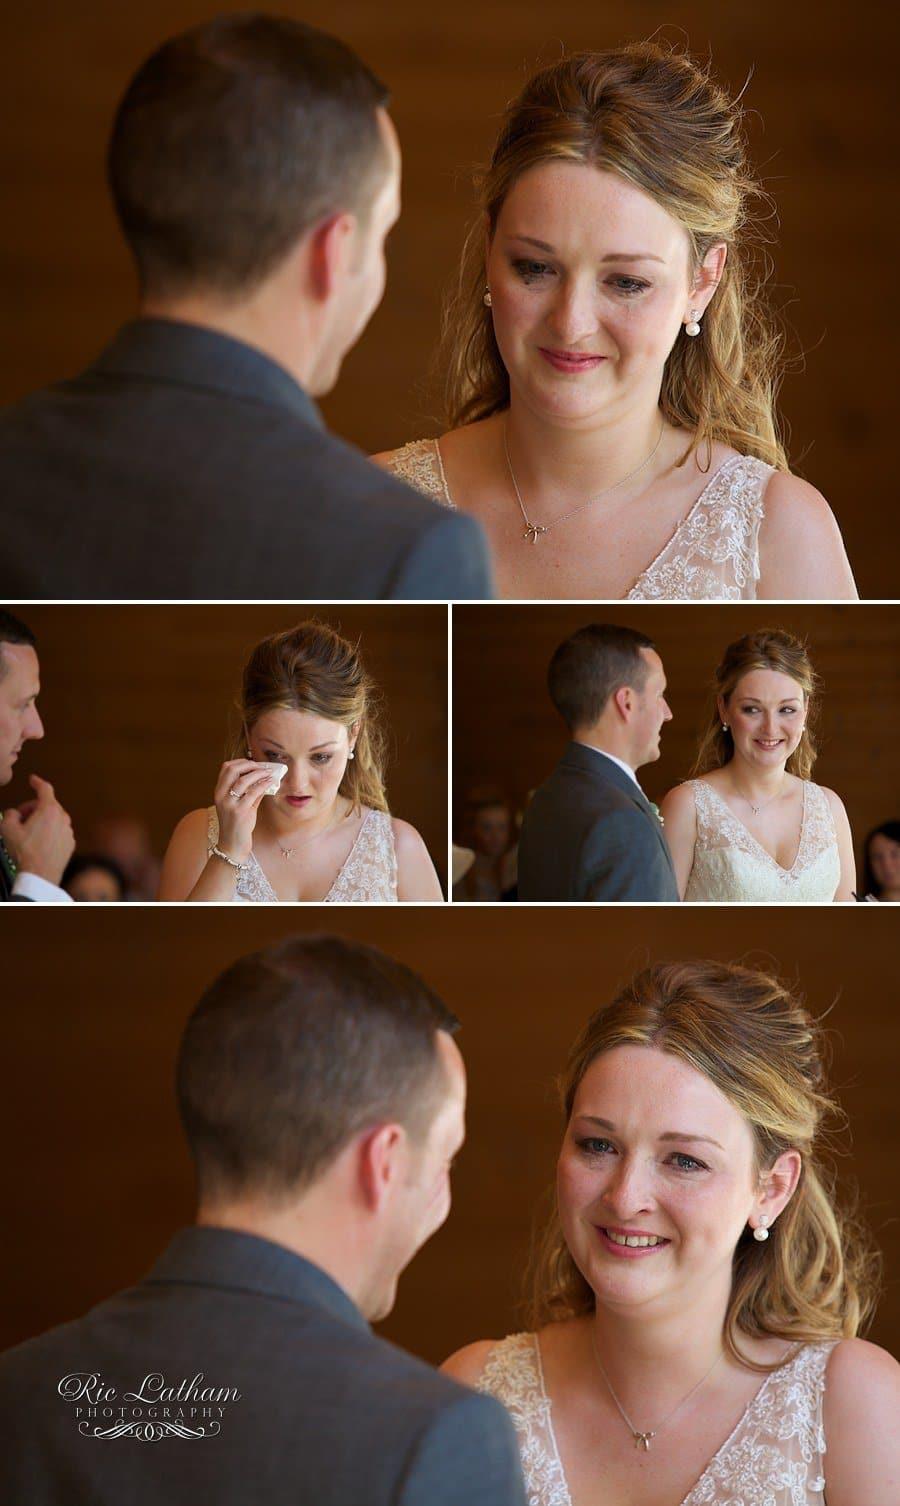 brides mascara running